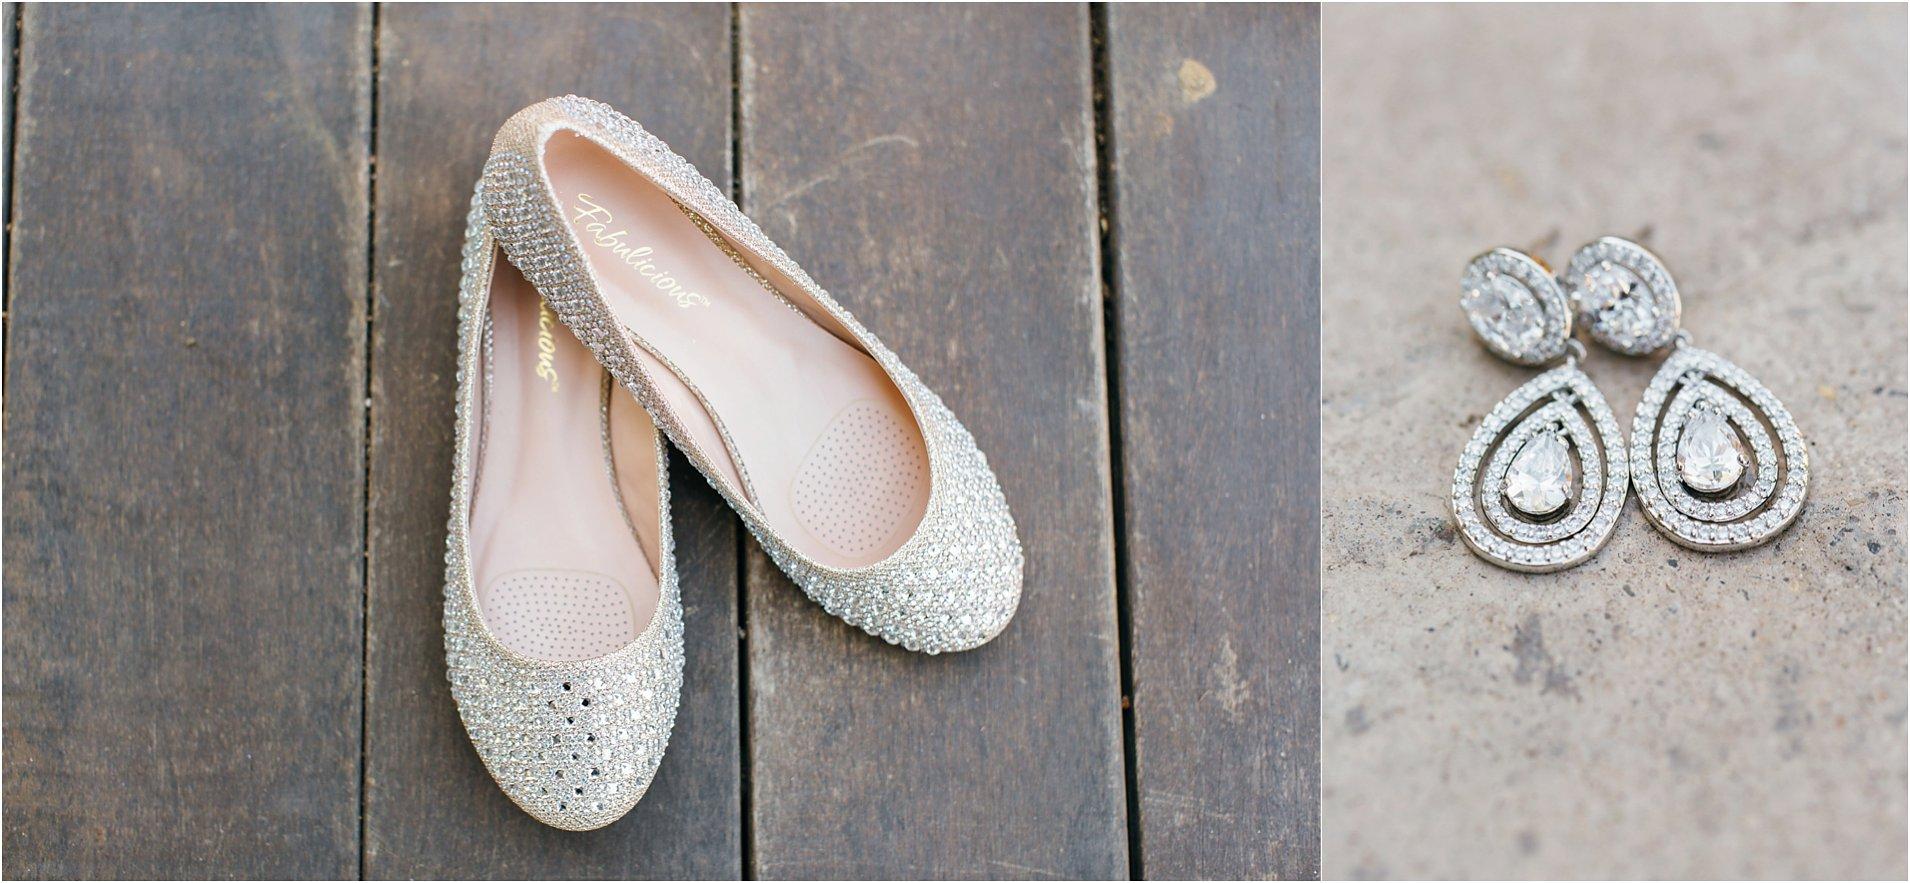 Bridal jewelry and wedding flats